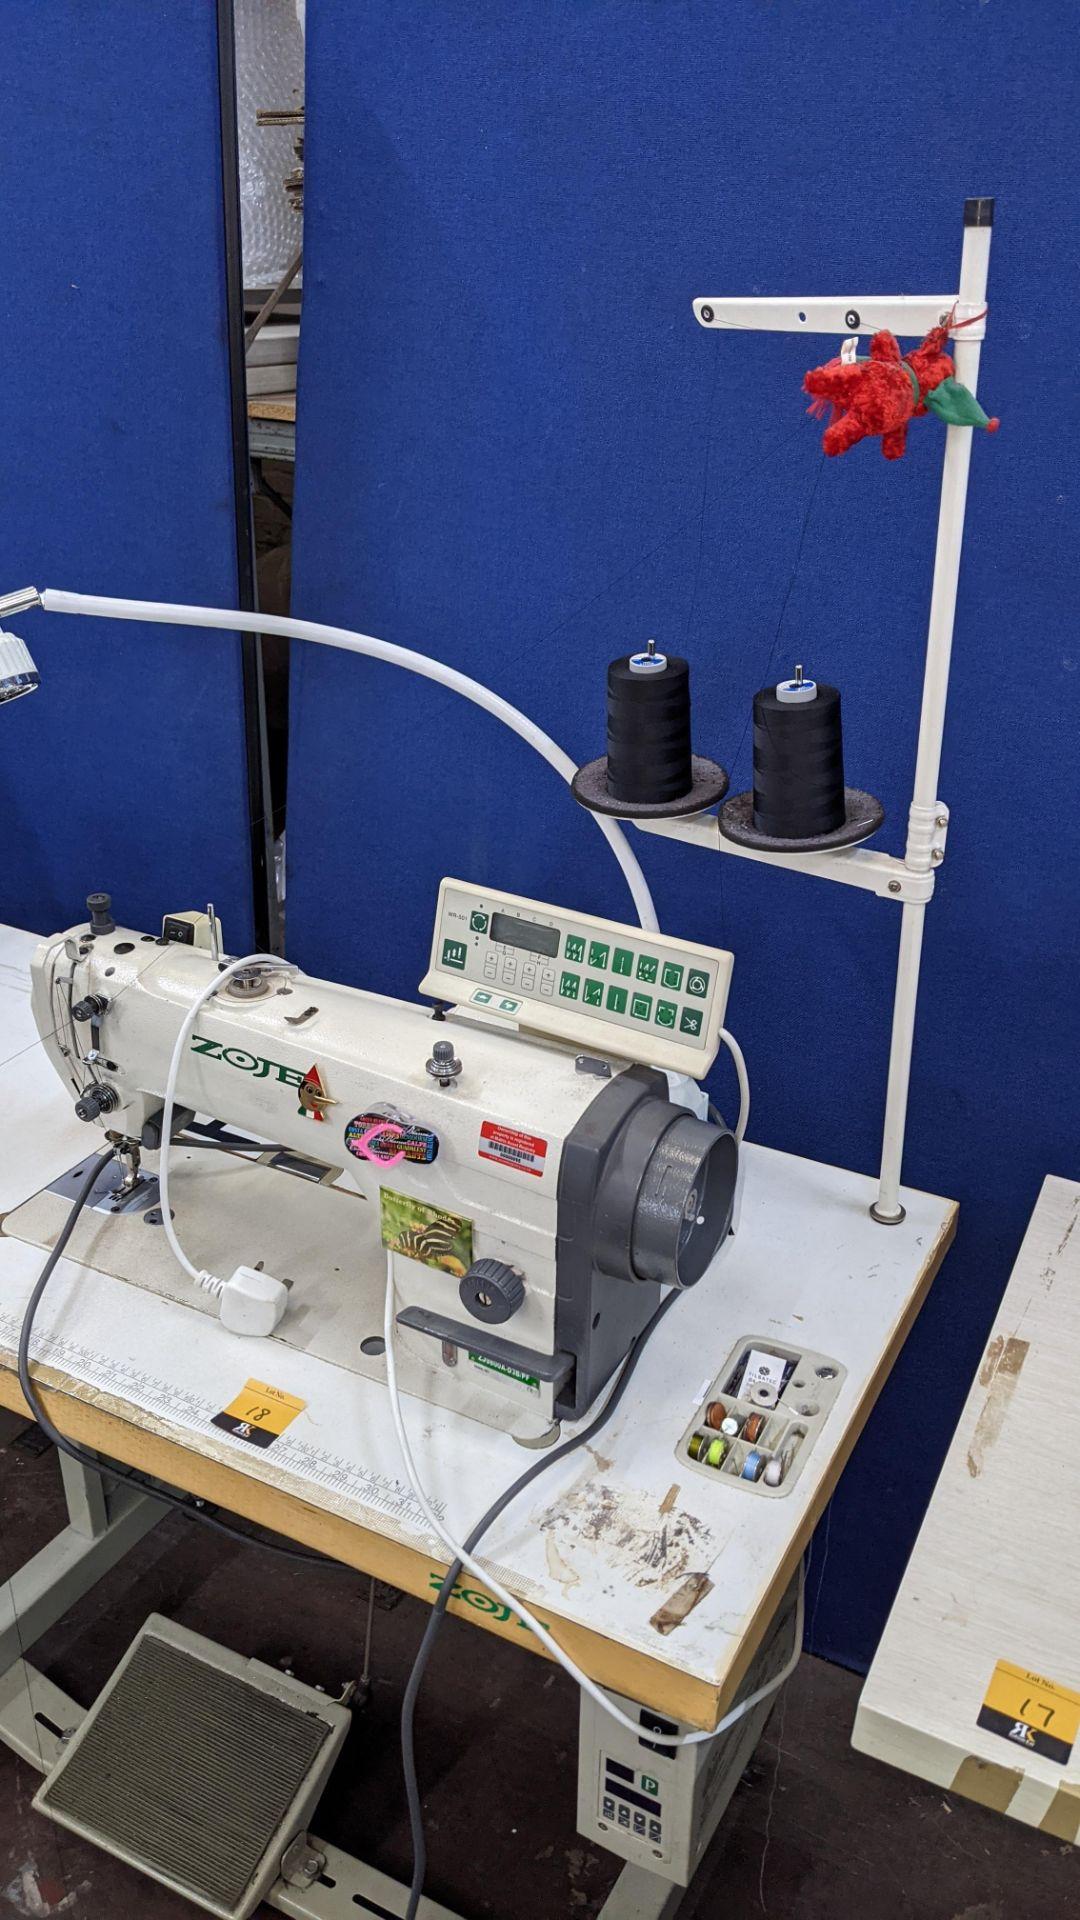 Zoje model ZJ9800A-D3B/PF lockstitch sewing machine with model WR-501 digital controller - Image 19 of 20